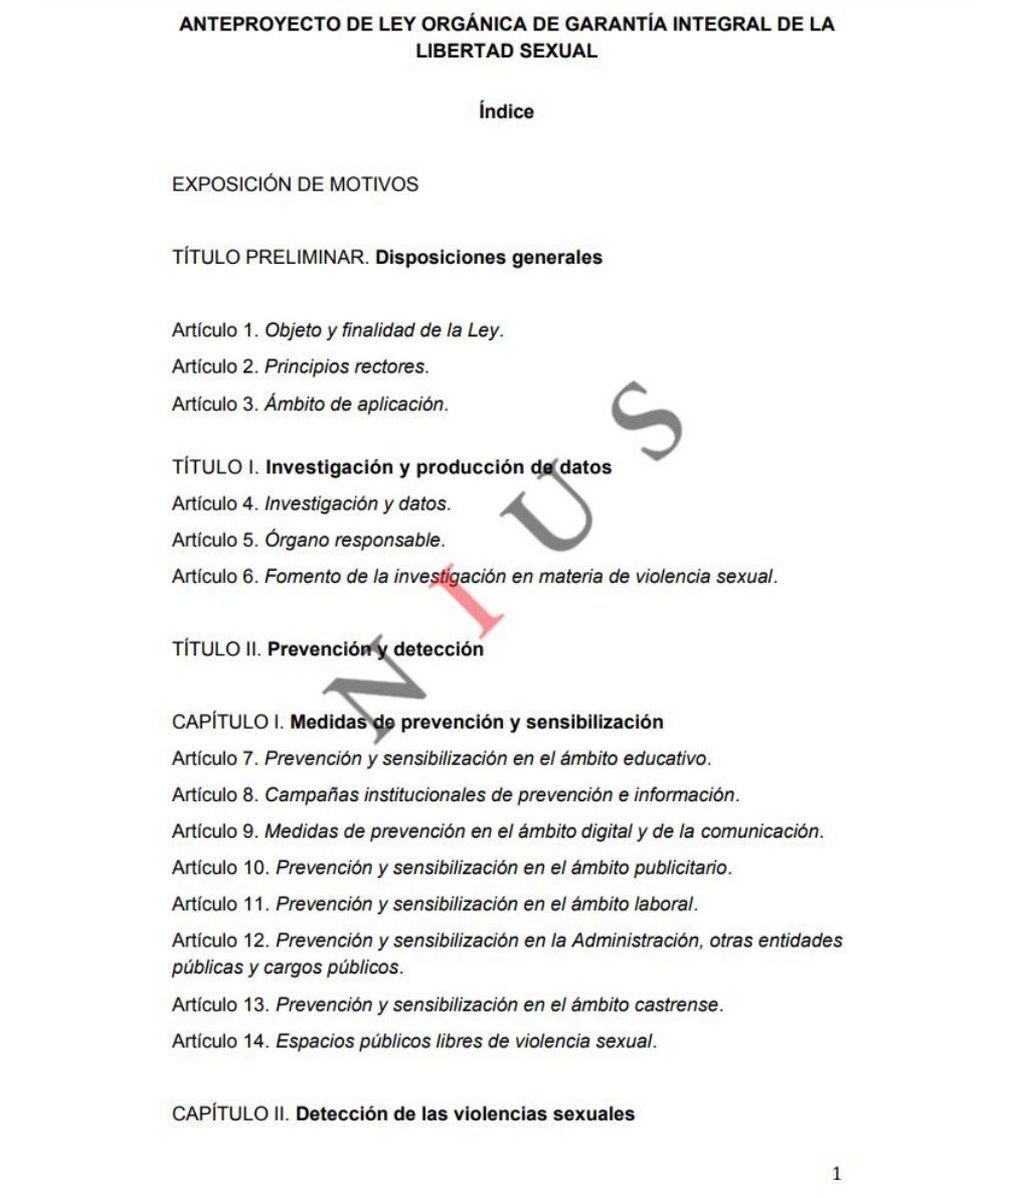 Anteproyecto de ley orgánica de garantía integral de la Libertad Sexual